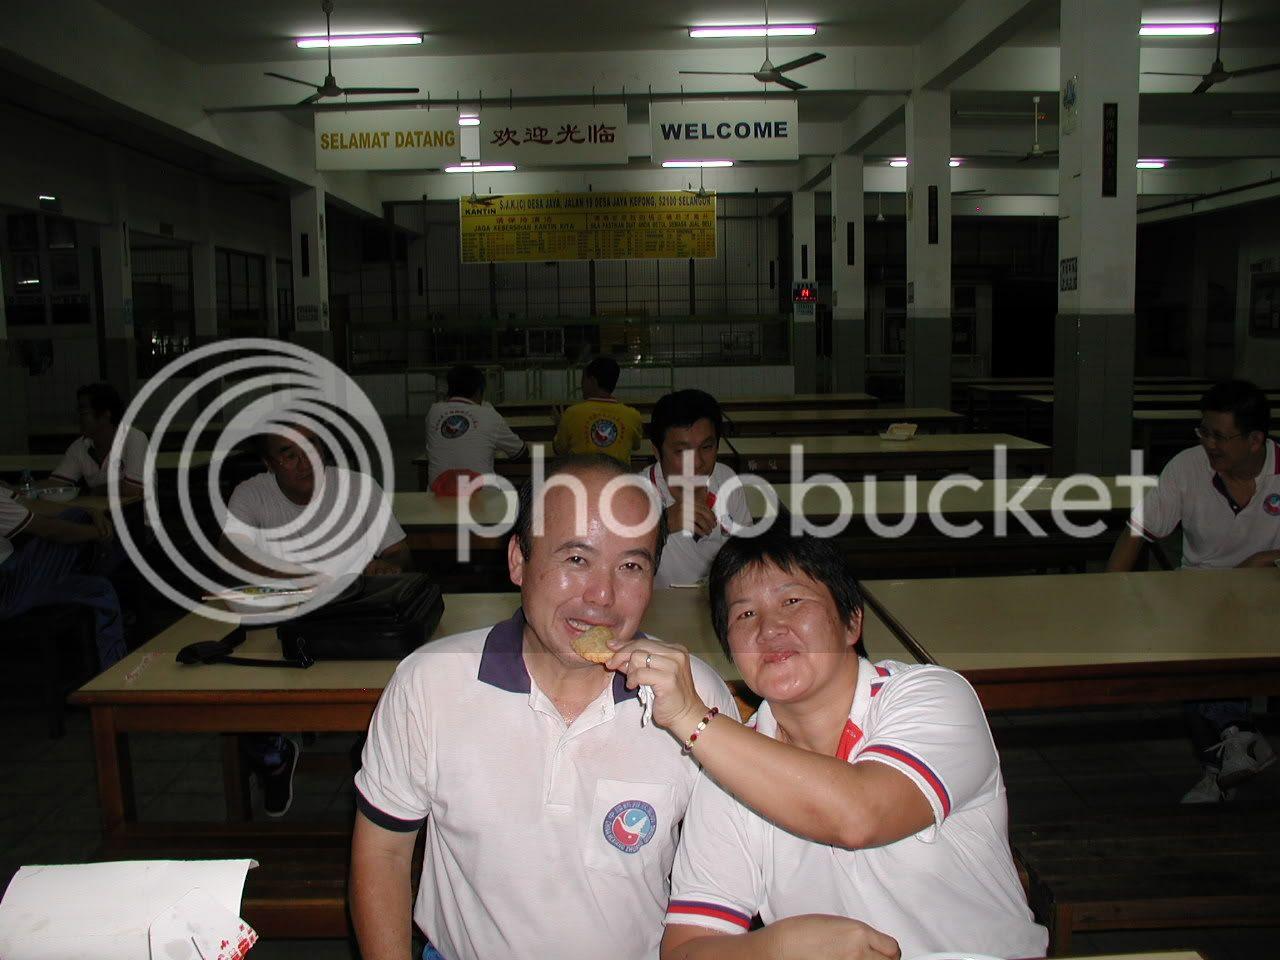 吉隆玻甲洞帝沙鹤功輔導站 Cscq Kepong Station Kuala Lumpur August 2006